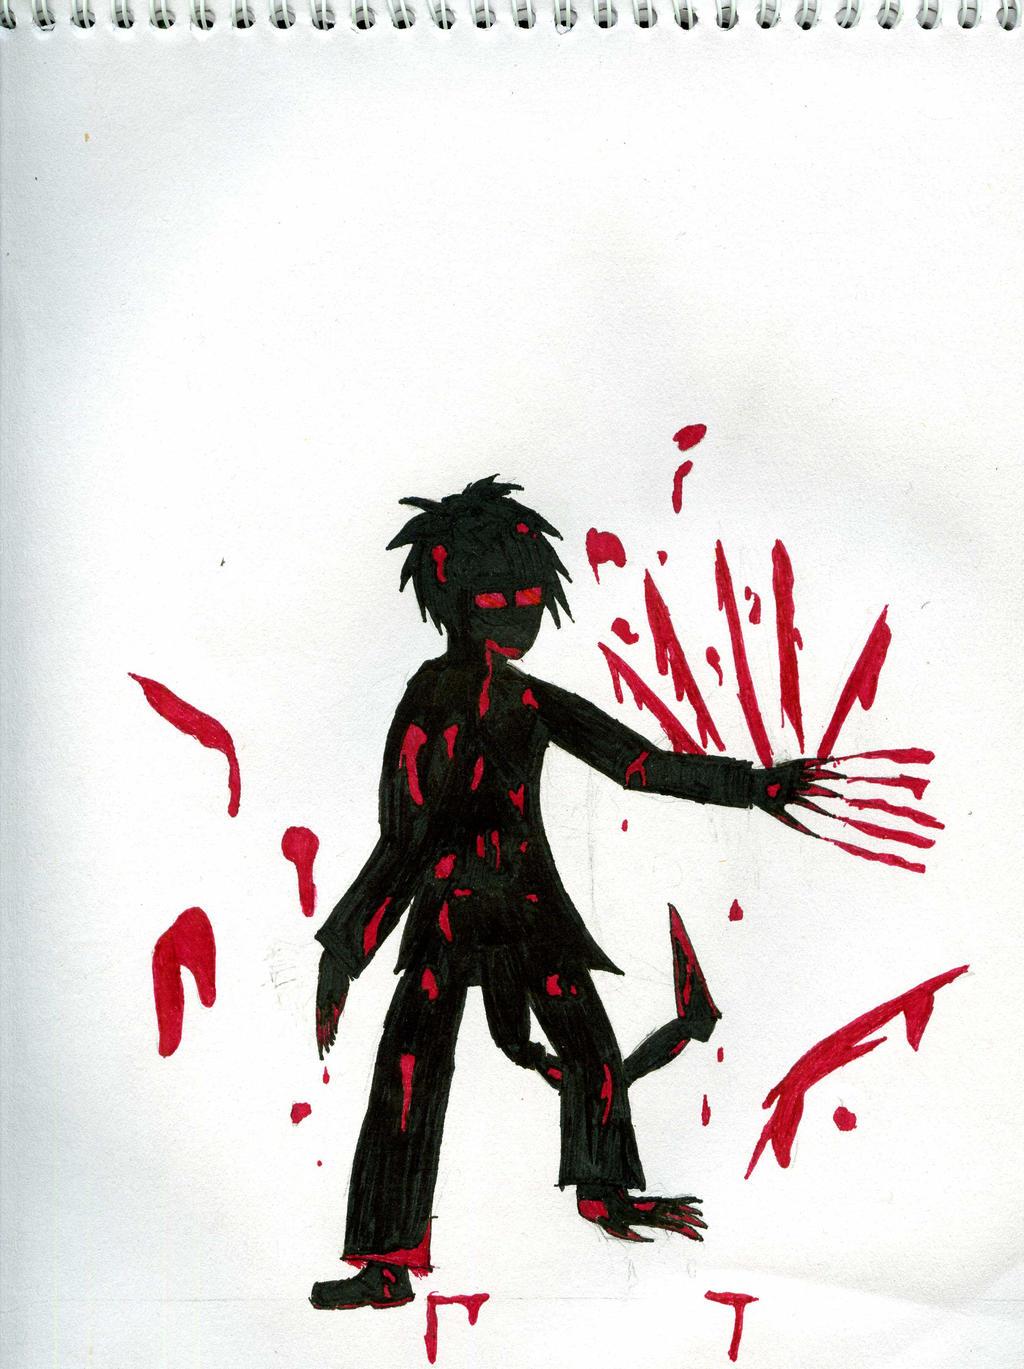 Villain OC silhouette preview by AnimeDogz